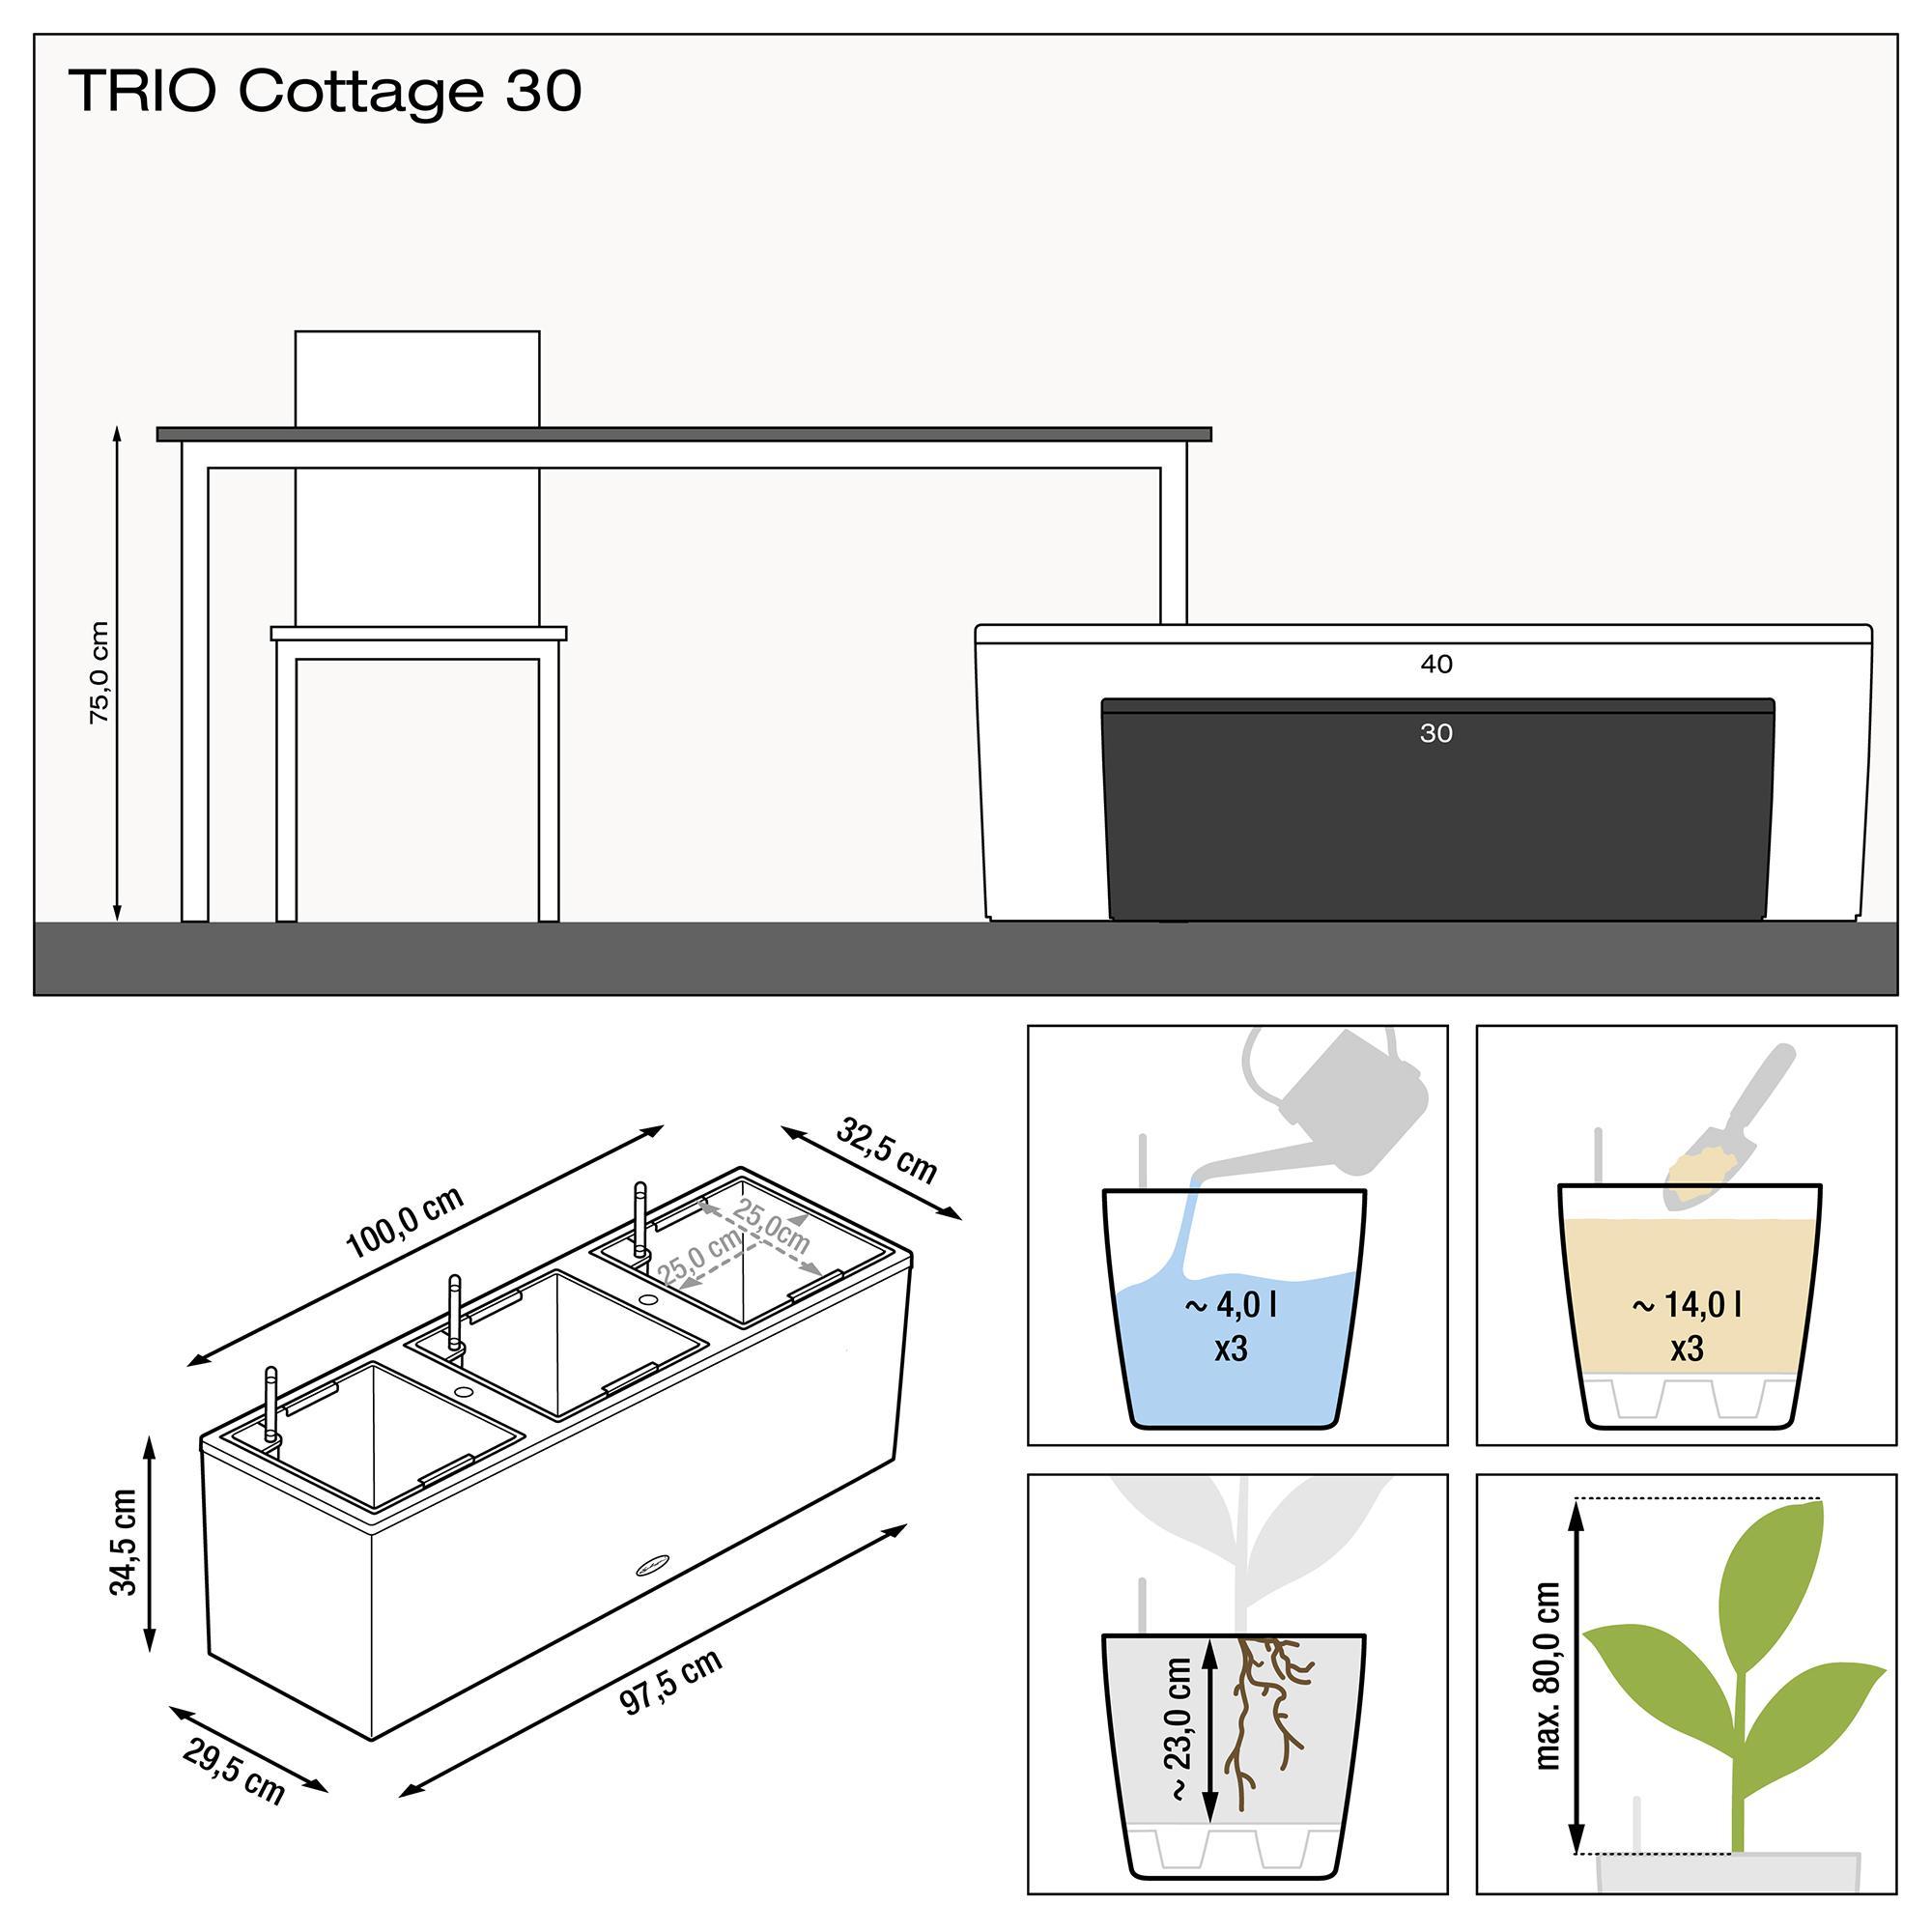 TRIO Cottage 30 mocha - Image 3